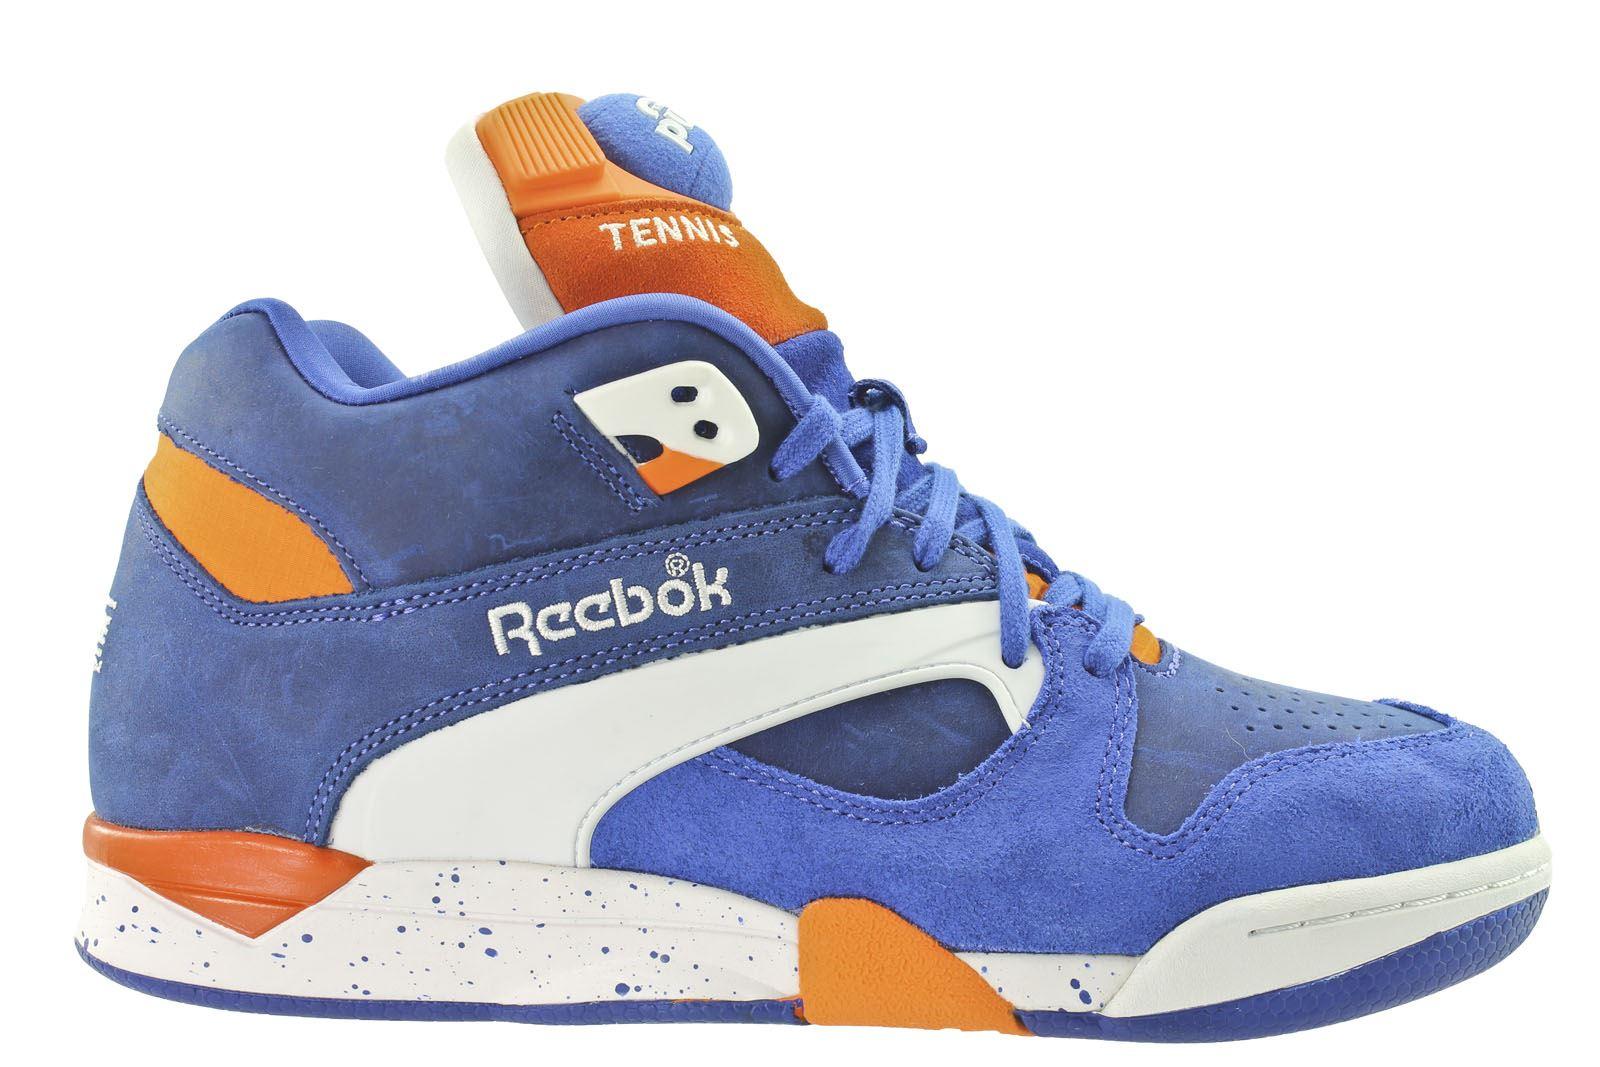 Mens reebok pump omni lite court victory pump boots - Reebok pump omni lite limited edition ...